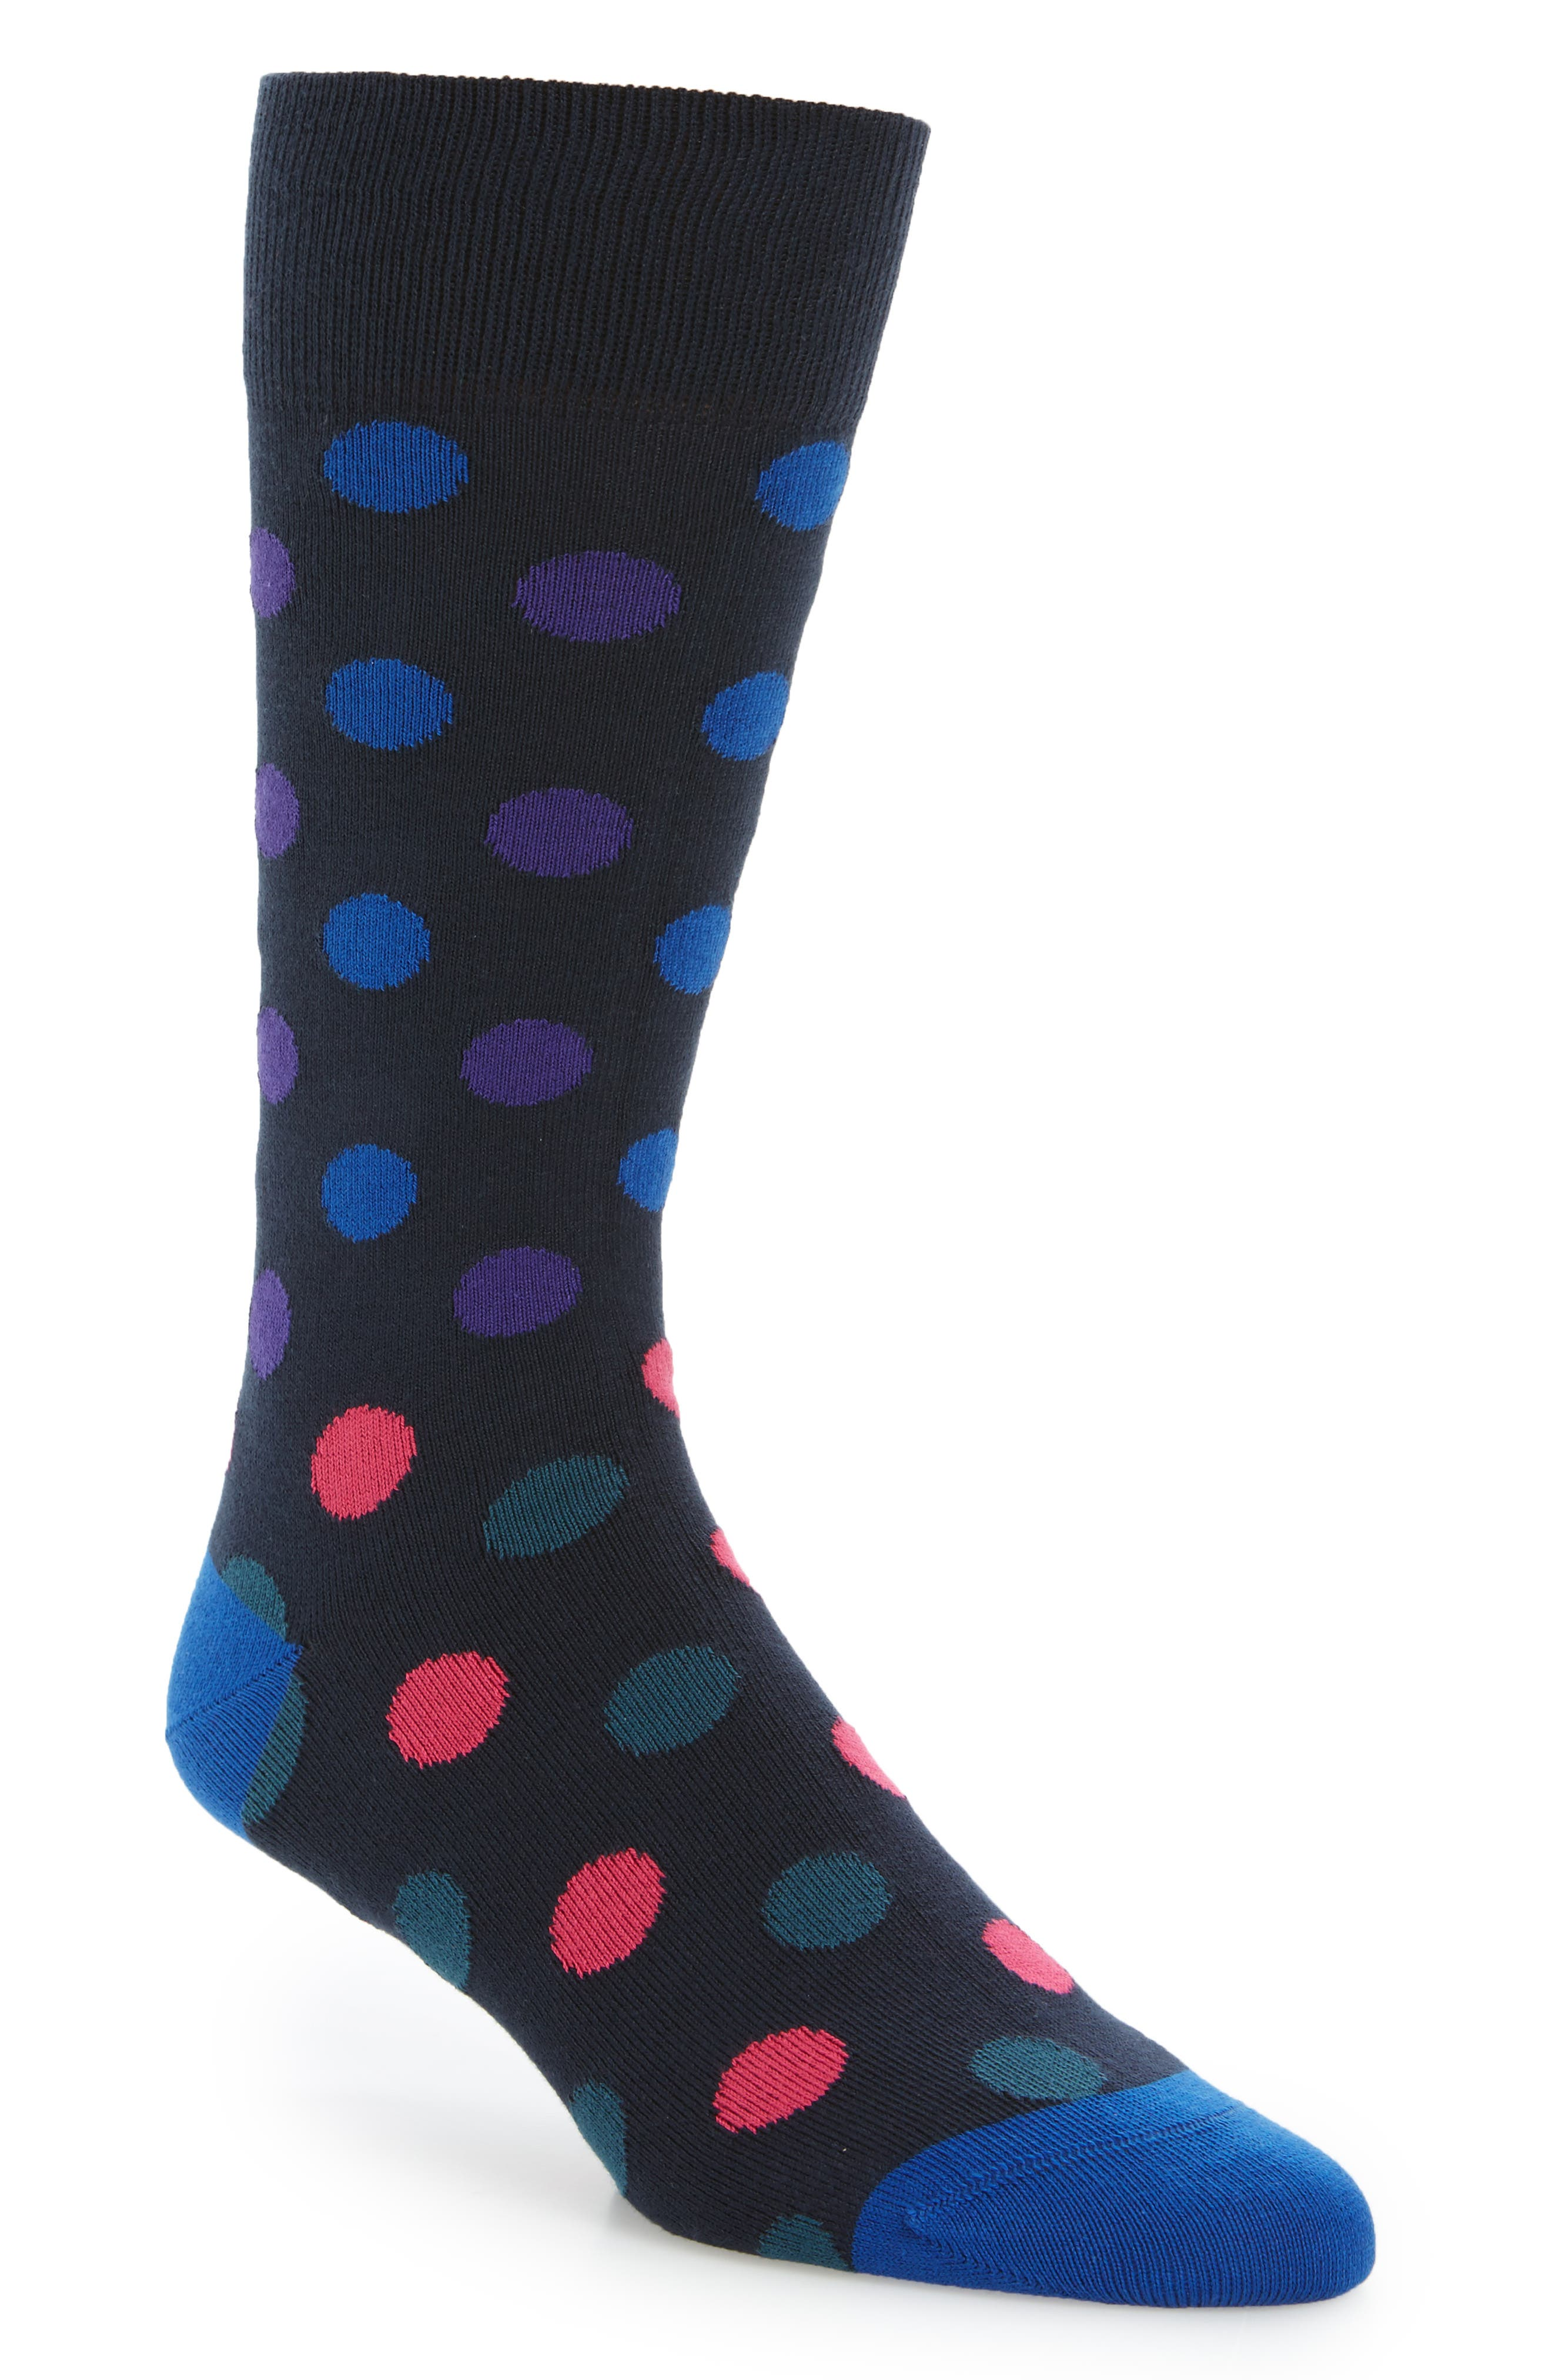 Main Image - Paul Smith Samic Polka Dot Socks